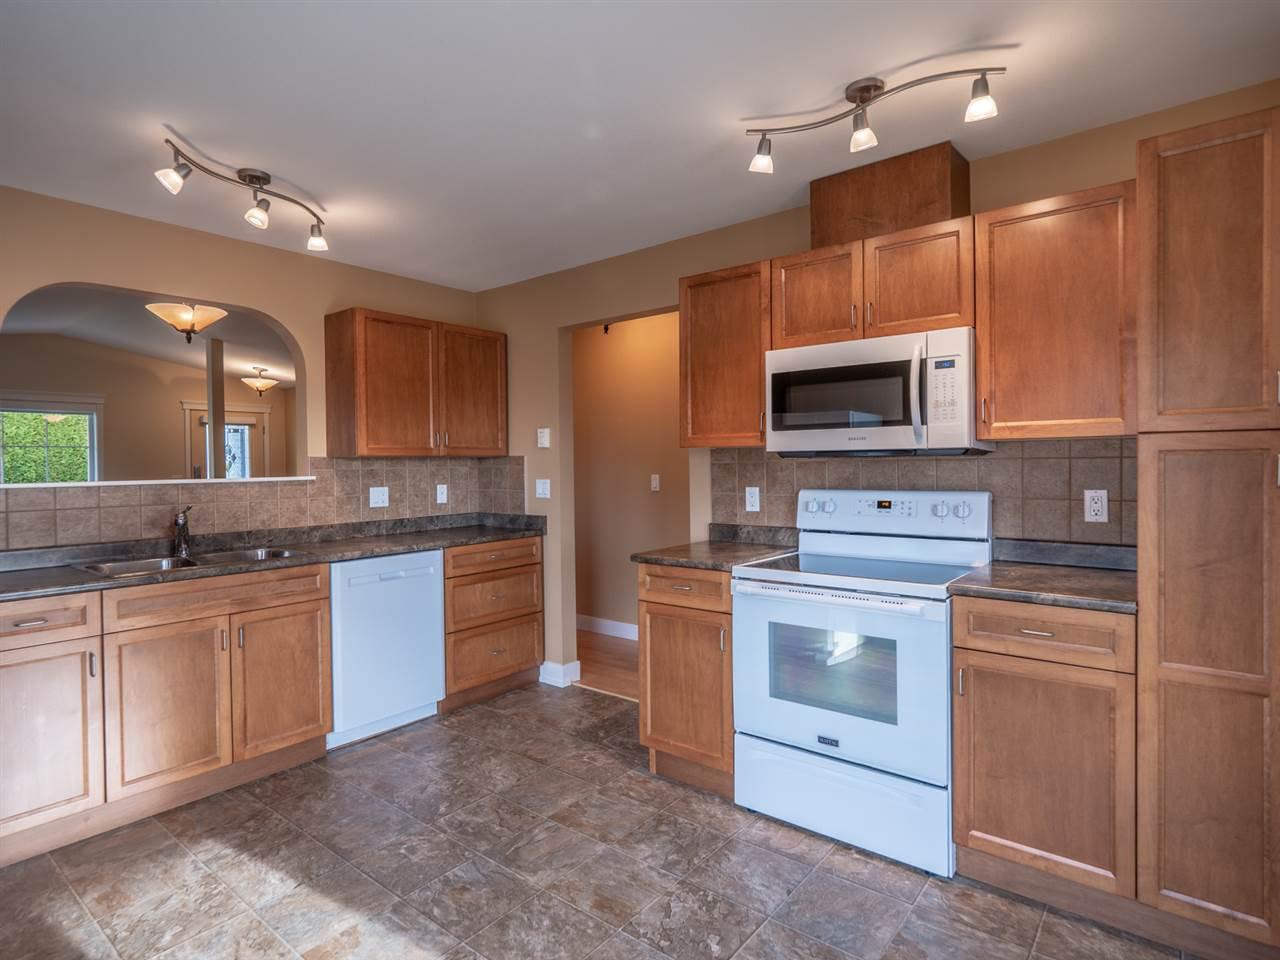 Photo 3: Photos: 5708 EMILY Way in Sechelt: Sechelt District House for sale (Sunshine Coast)  : MLS®# R2328606